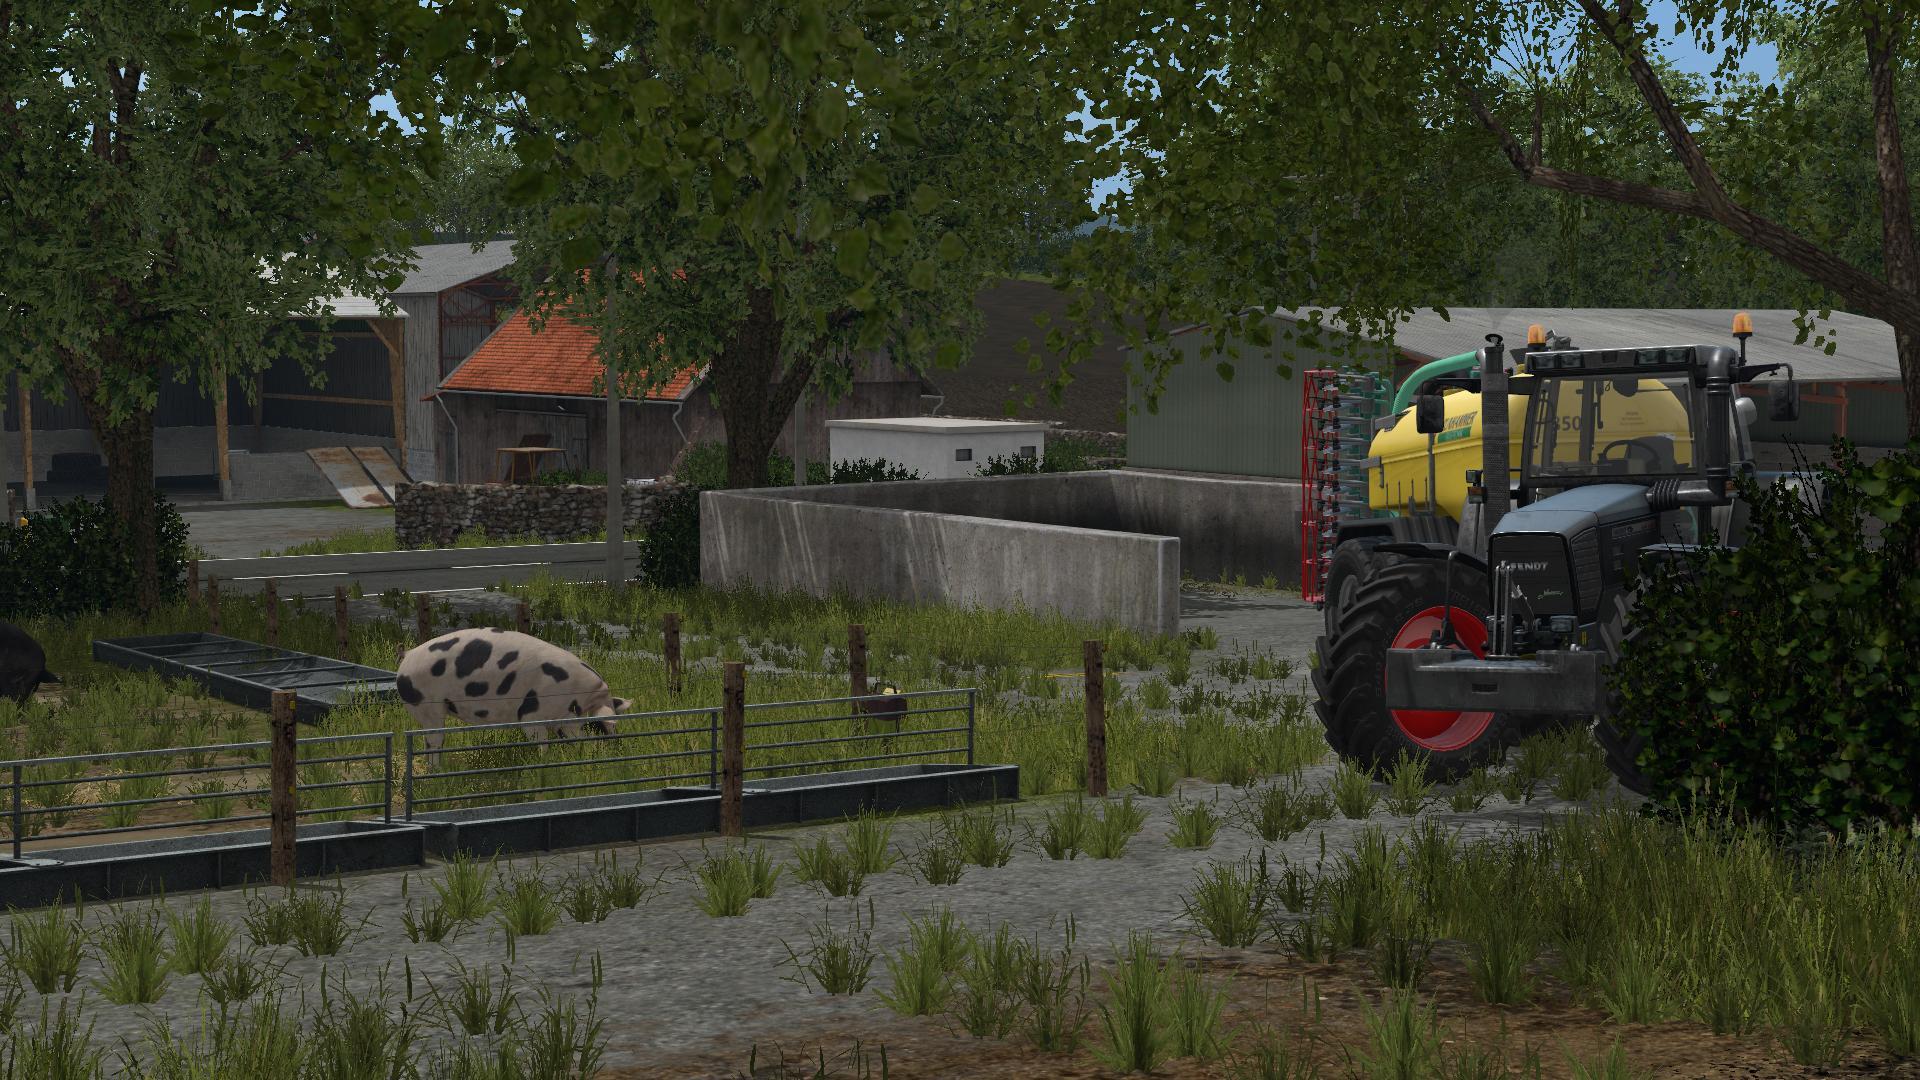 campagne xelmathienne v2 0 fs17 farming simulator 17 2017 mod. Black Bedroom Furniture Sets. Home Design Ideas